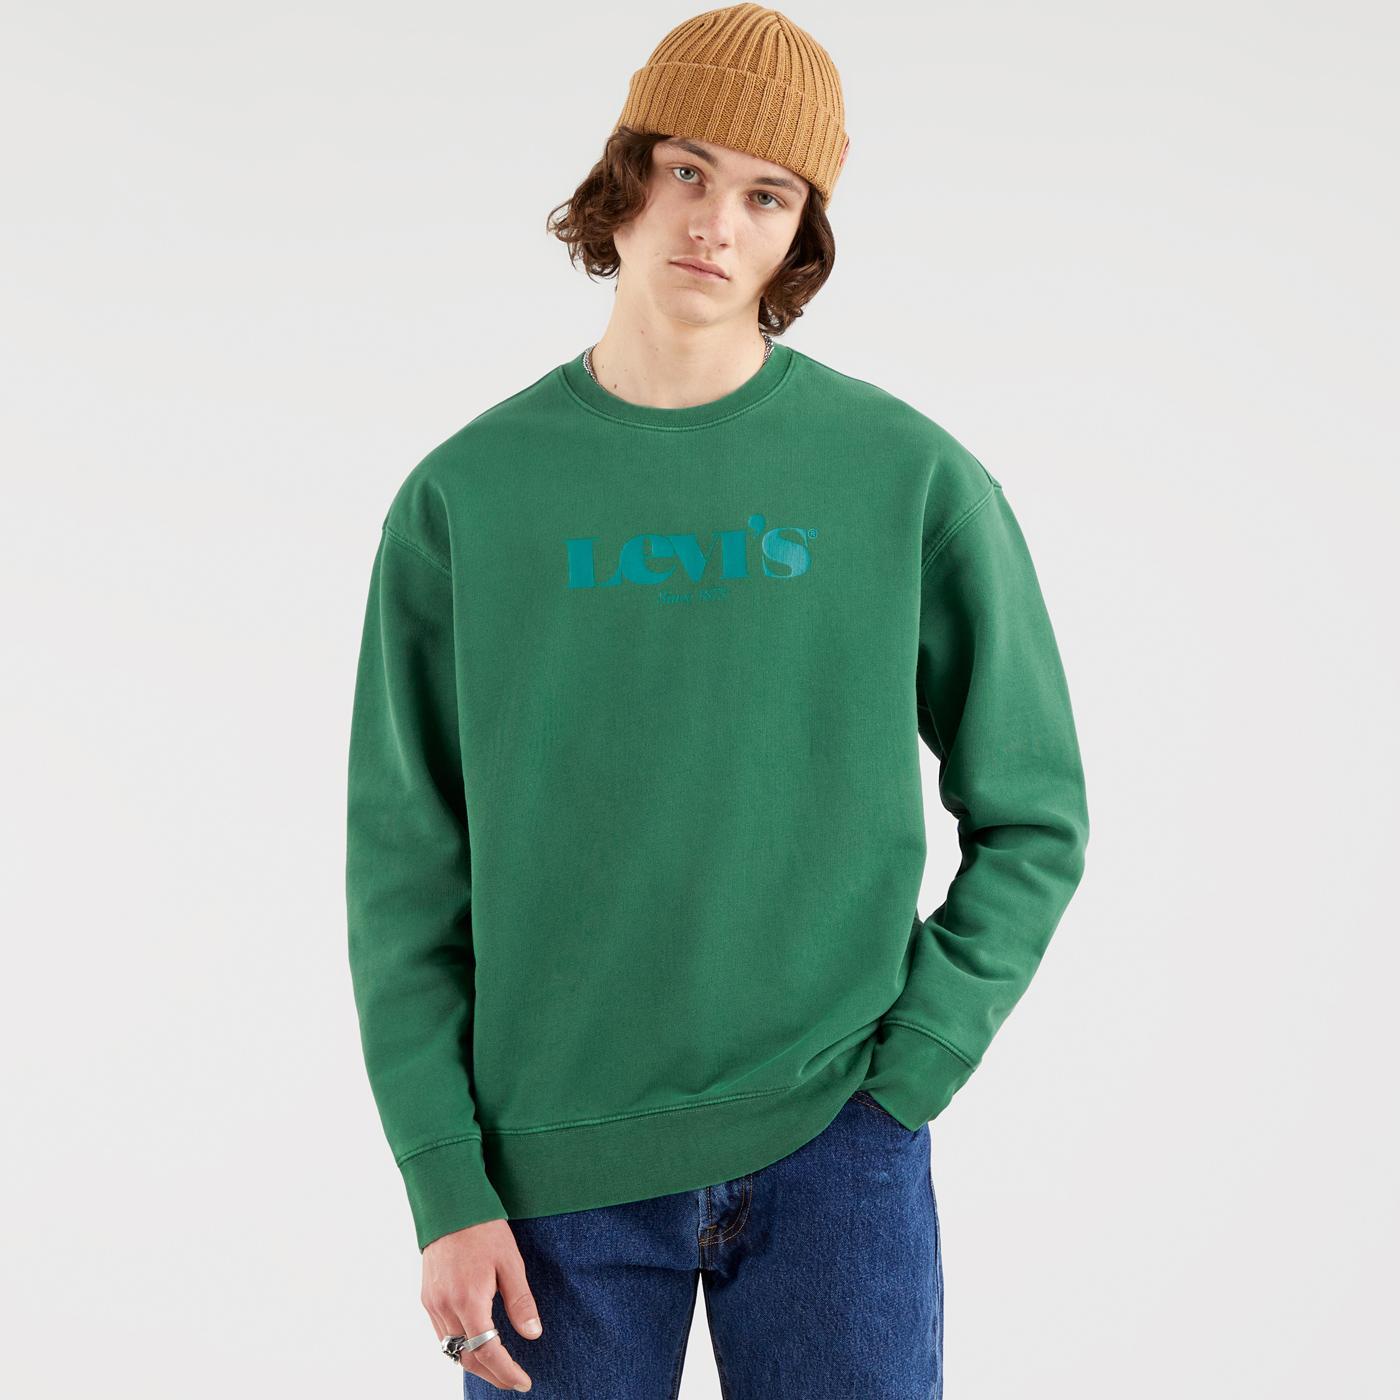 LEVI'S T2 Modern Vintage Logo Sweatshirt (Forest)